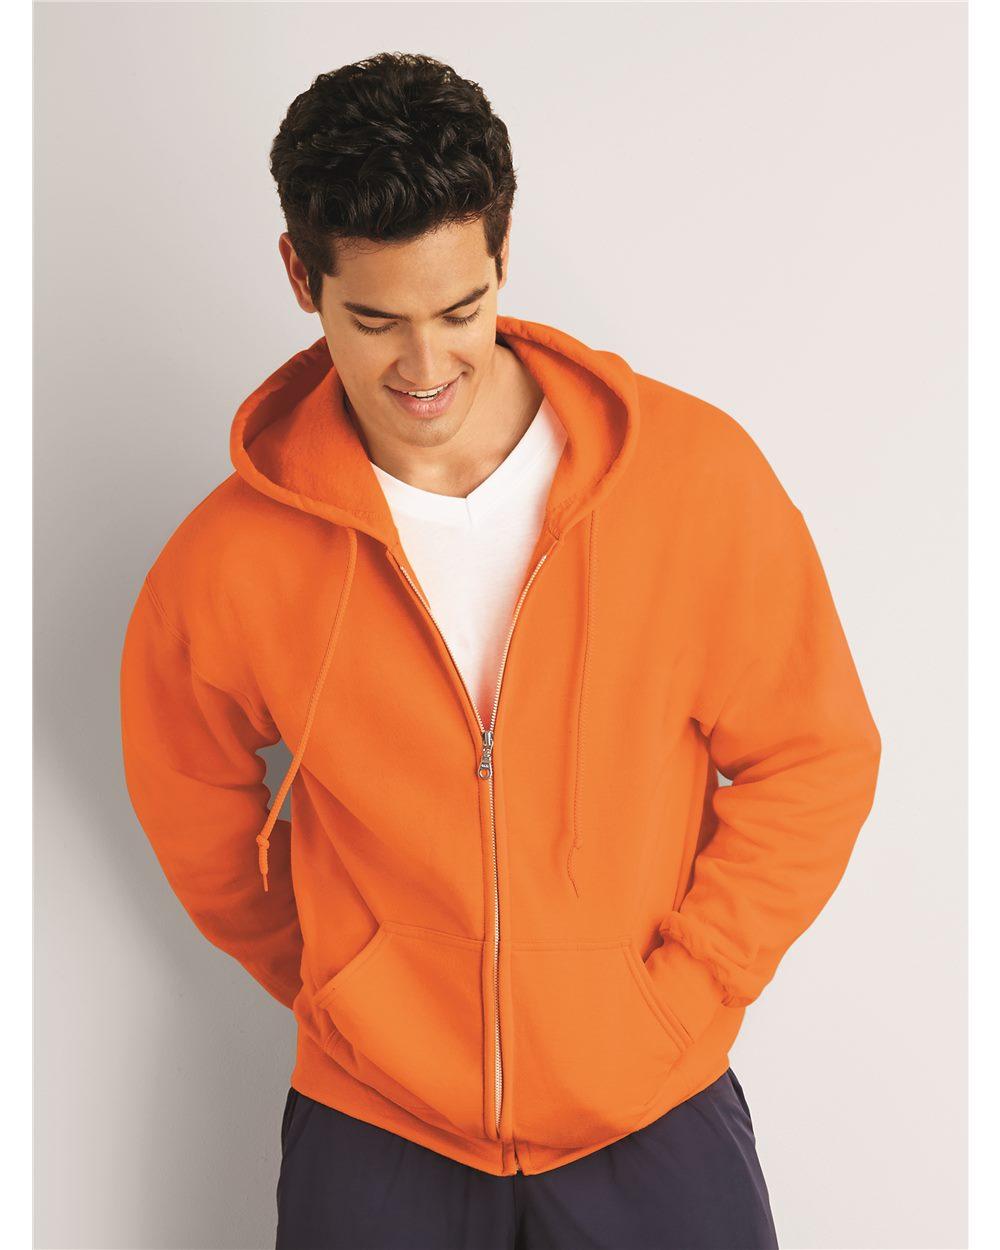 Gildan 吉尔丹 12600 Ultra混合布料全拉链连帽衫卫衣